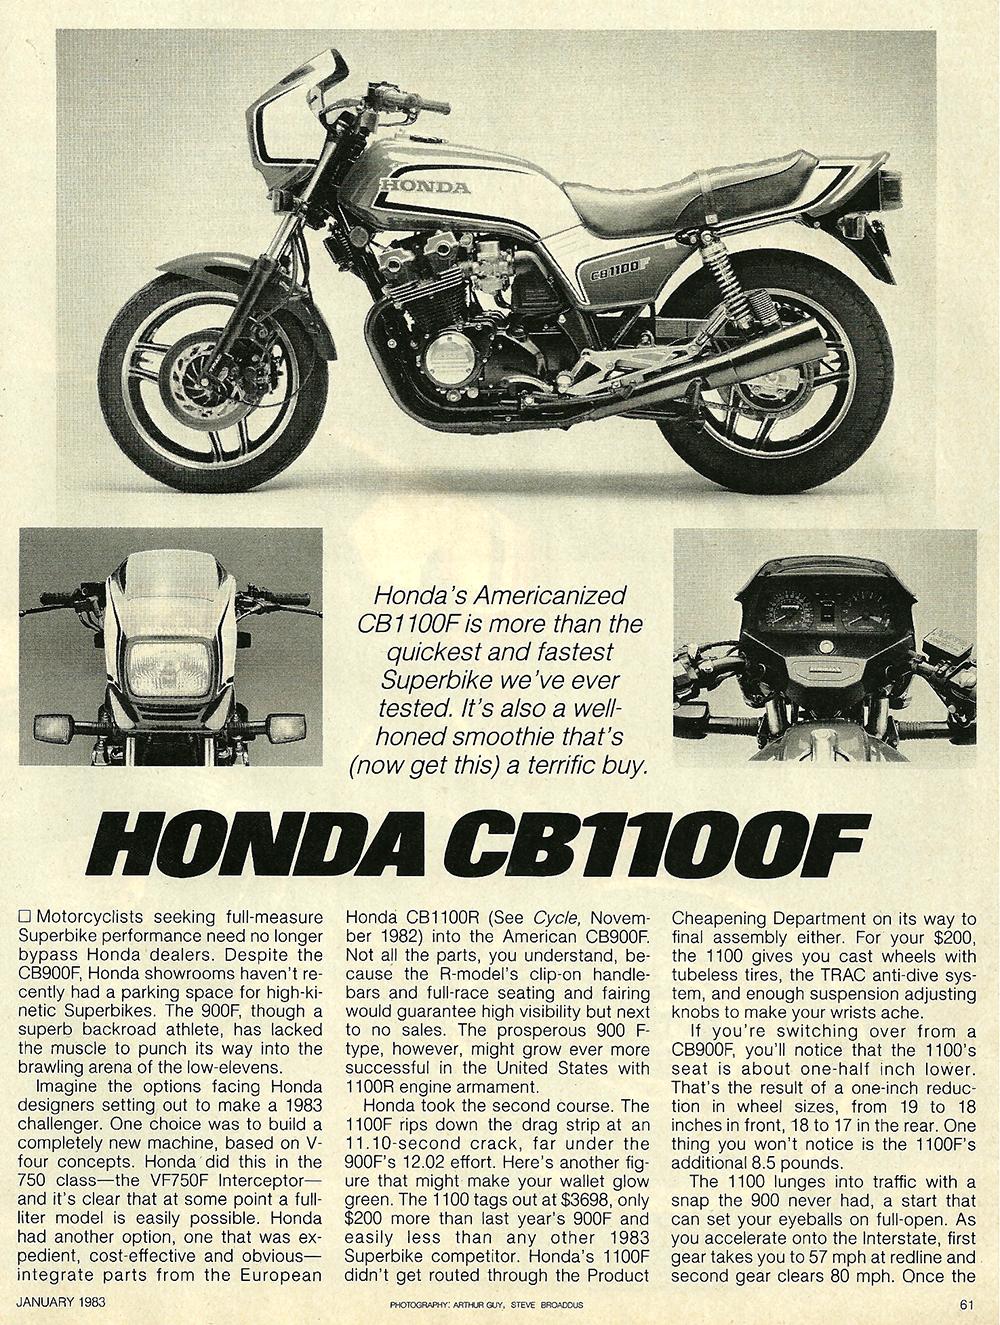 1983 Honda CB1100F road test 2.jpg